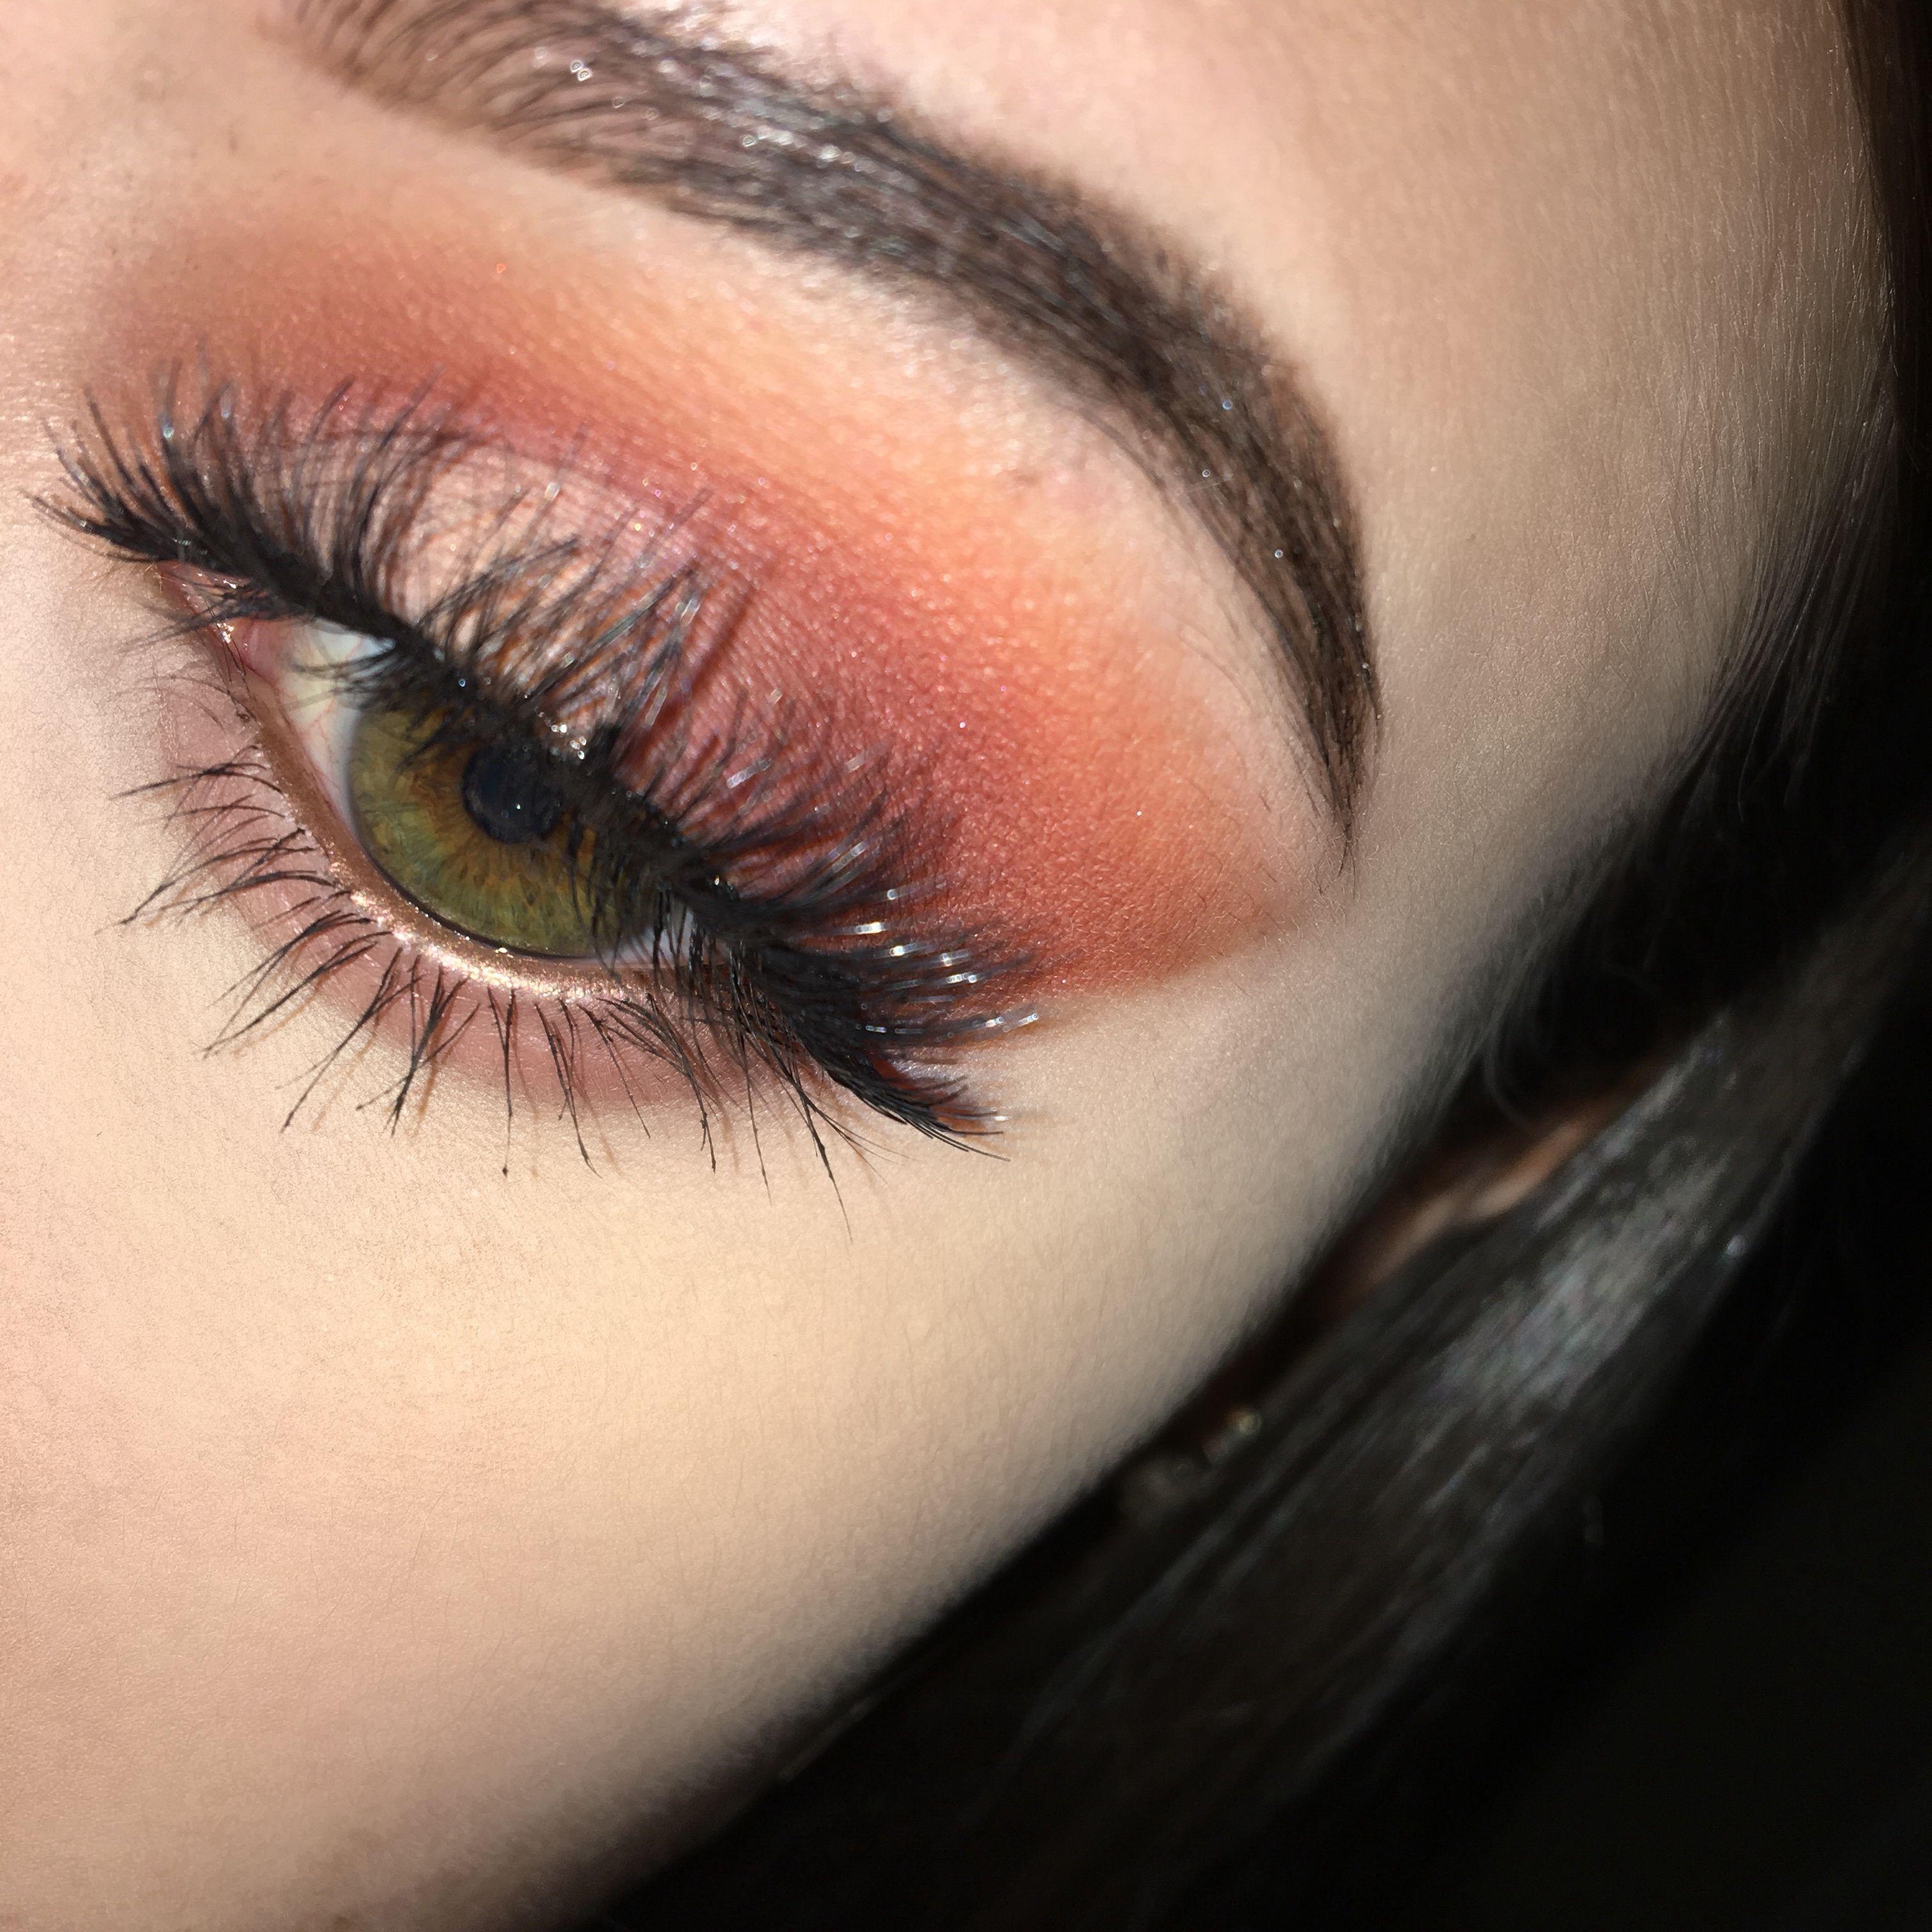 Too Faced Just Peachy Mattes Palette Peach Eye Look